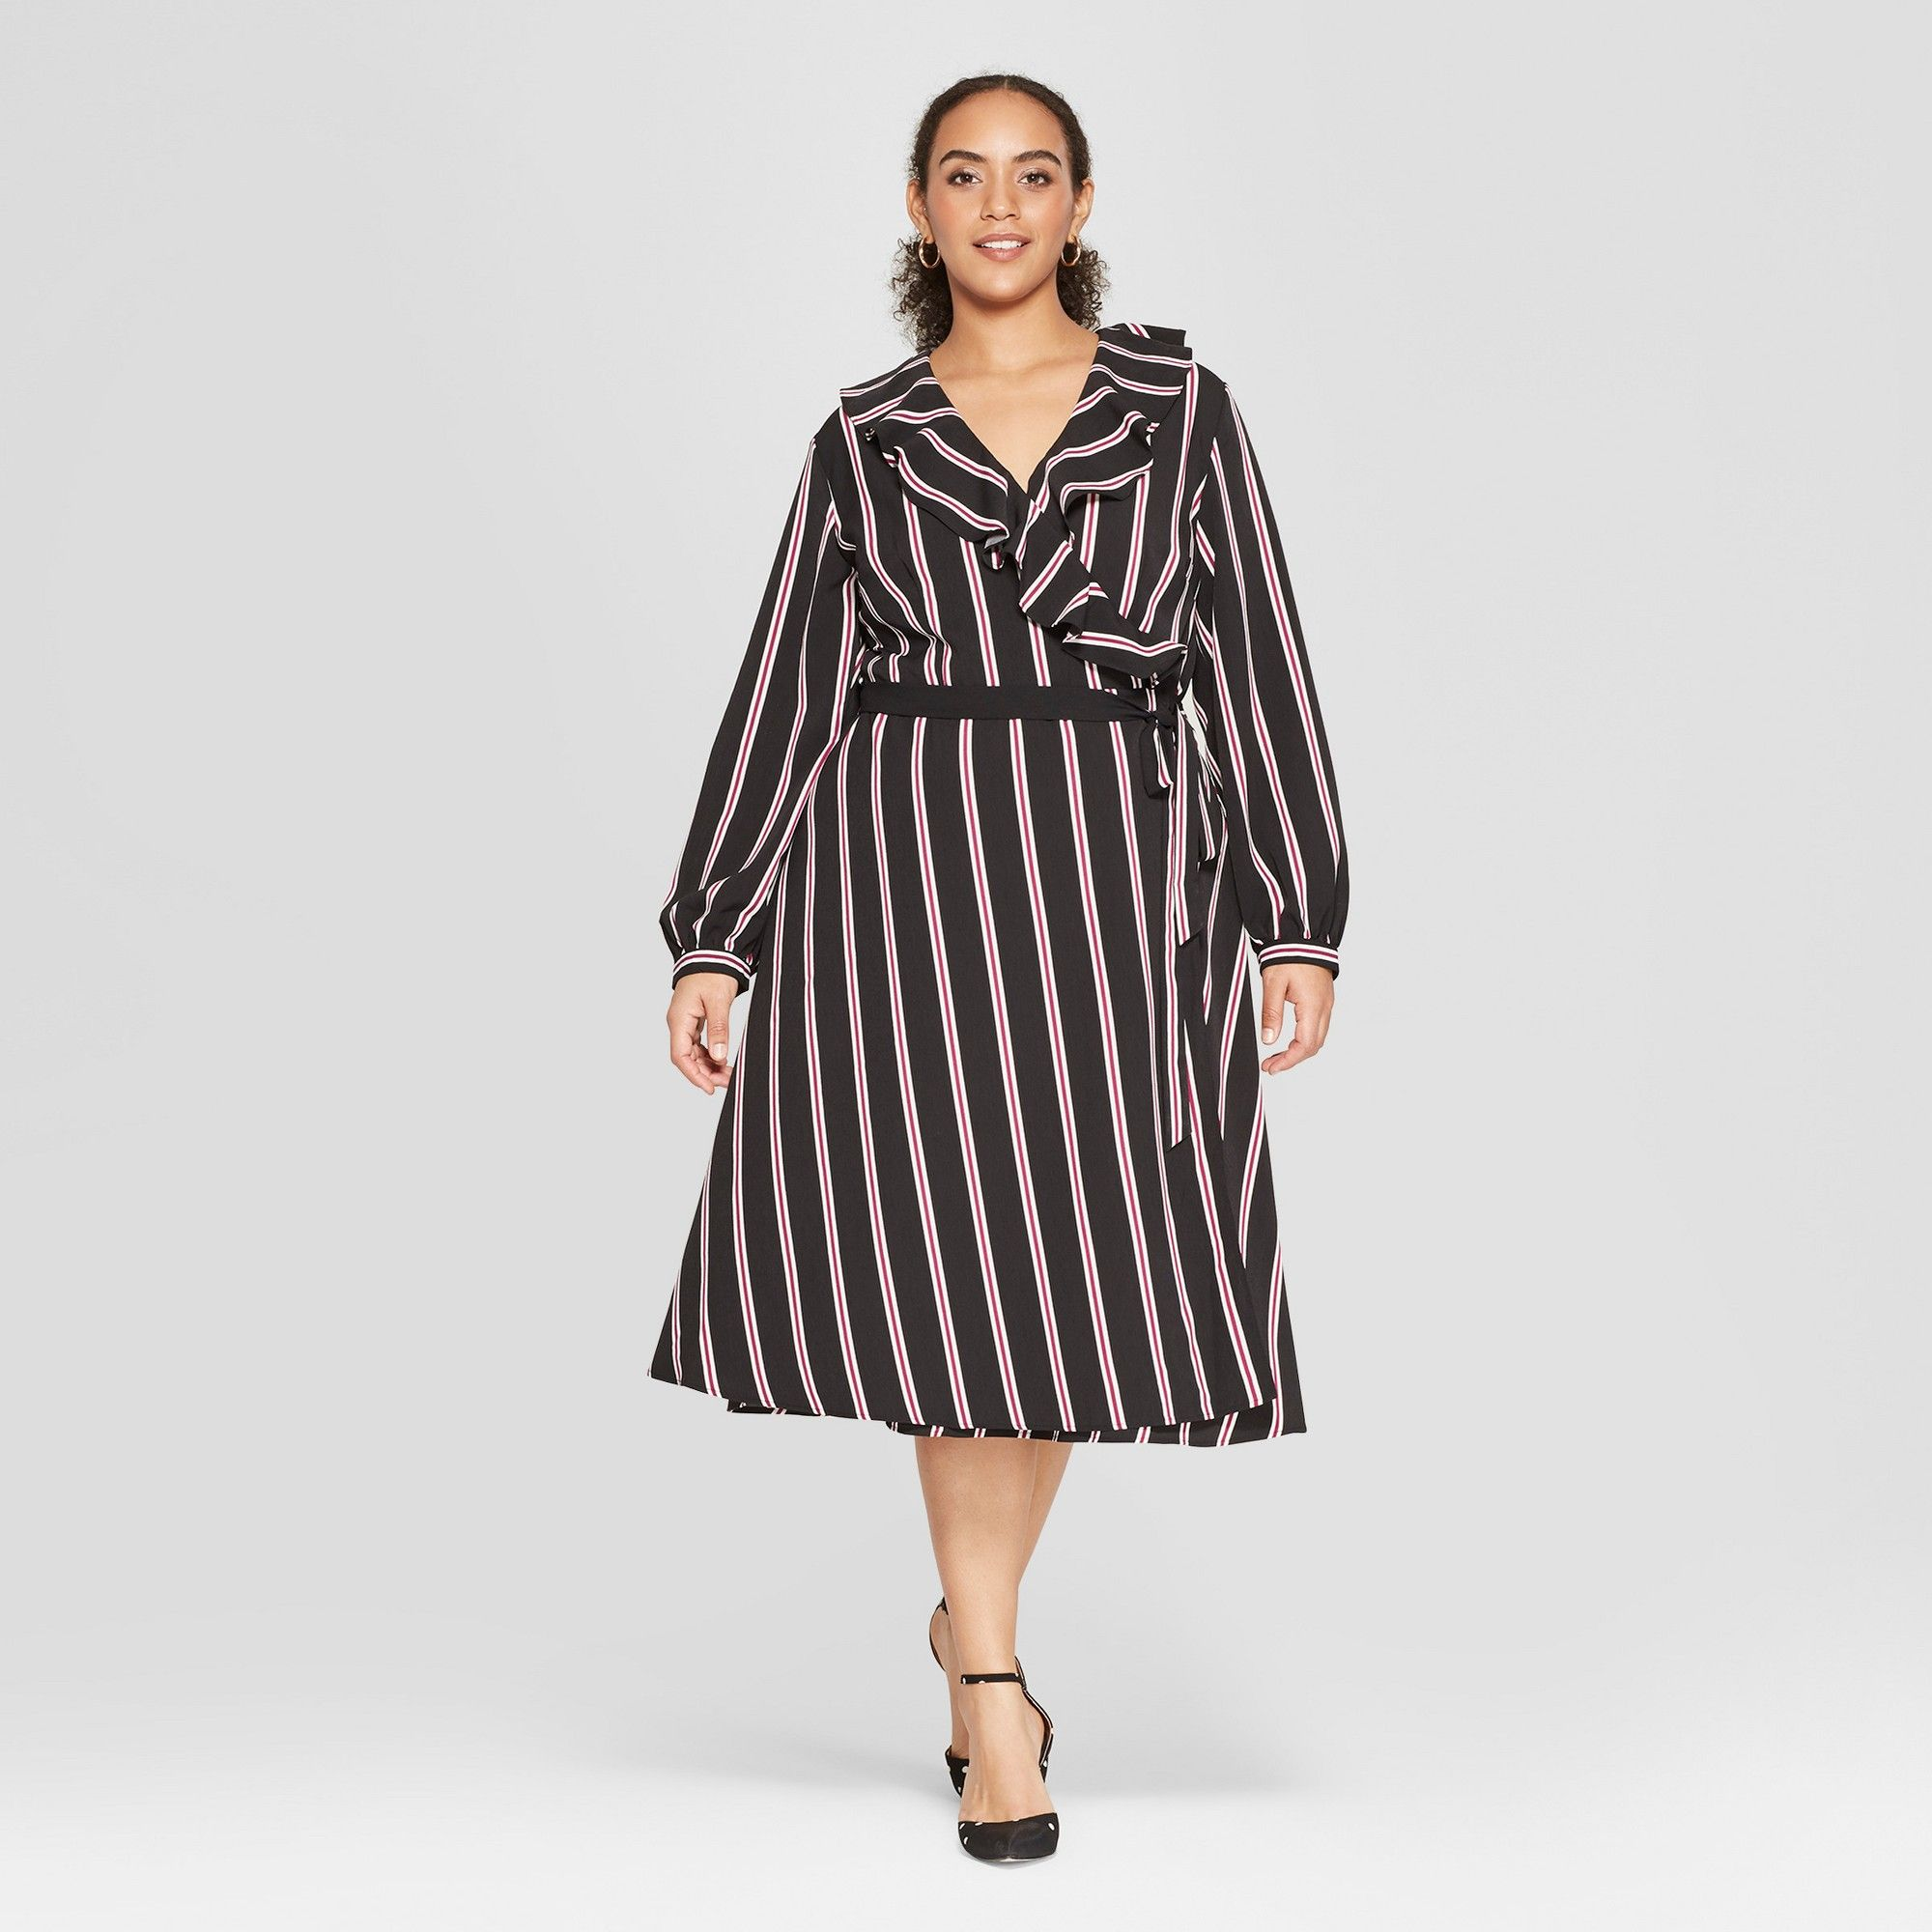 fefc34e1ff59 Long Black Wrap Dress Plus Size - raveitsafe